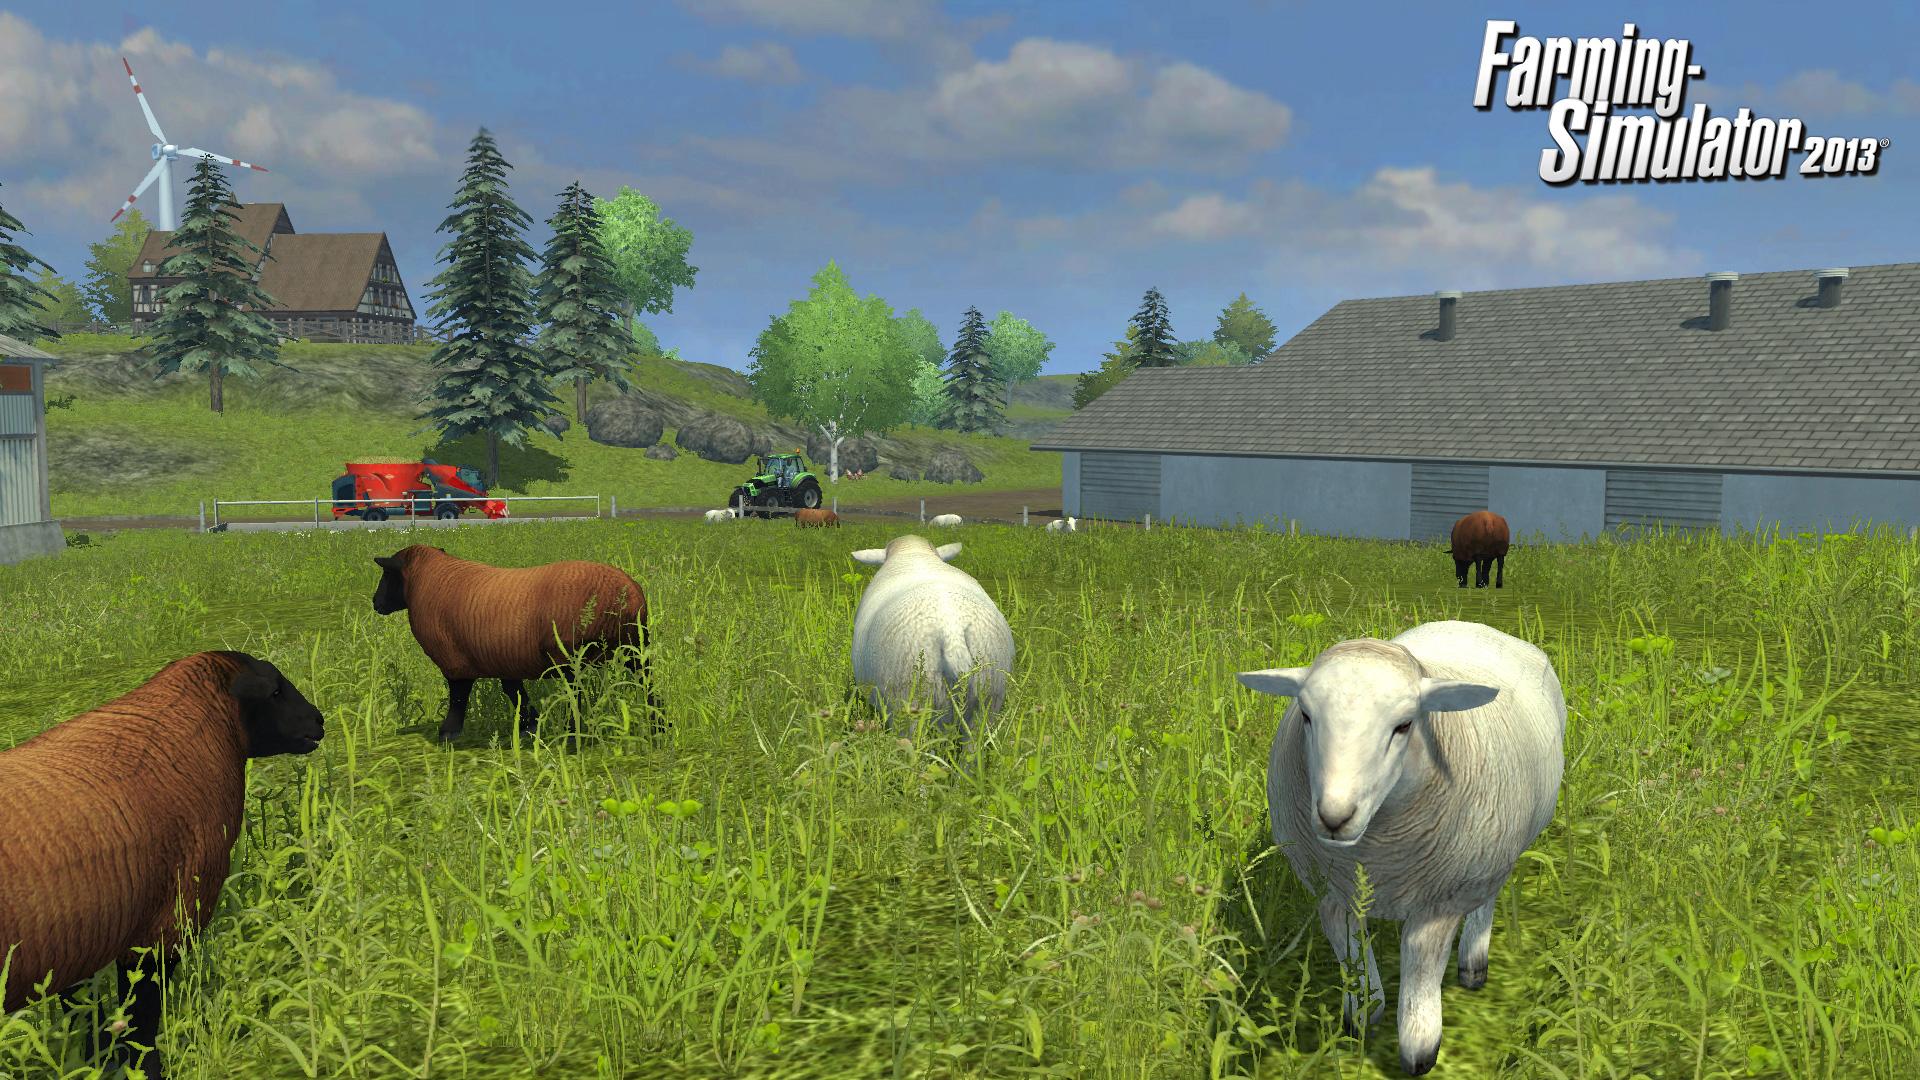 Farming Simulator 2013 Game